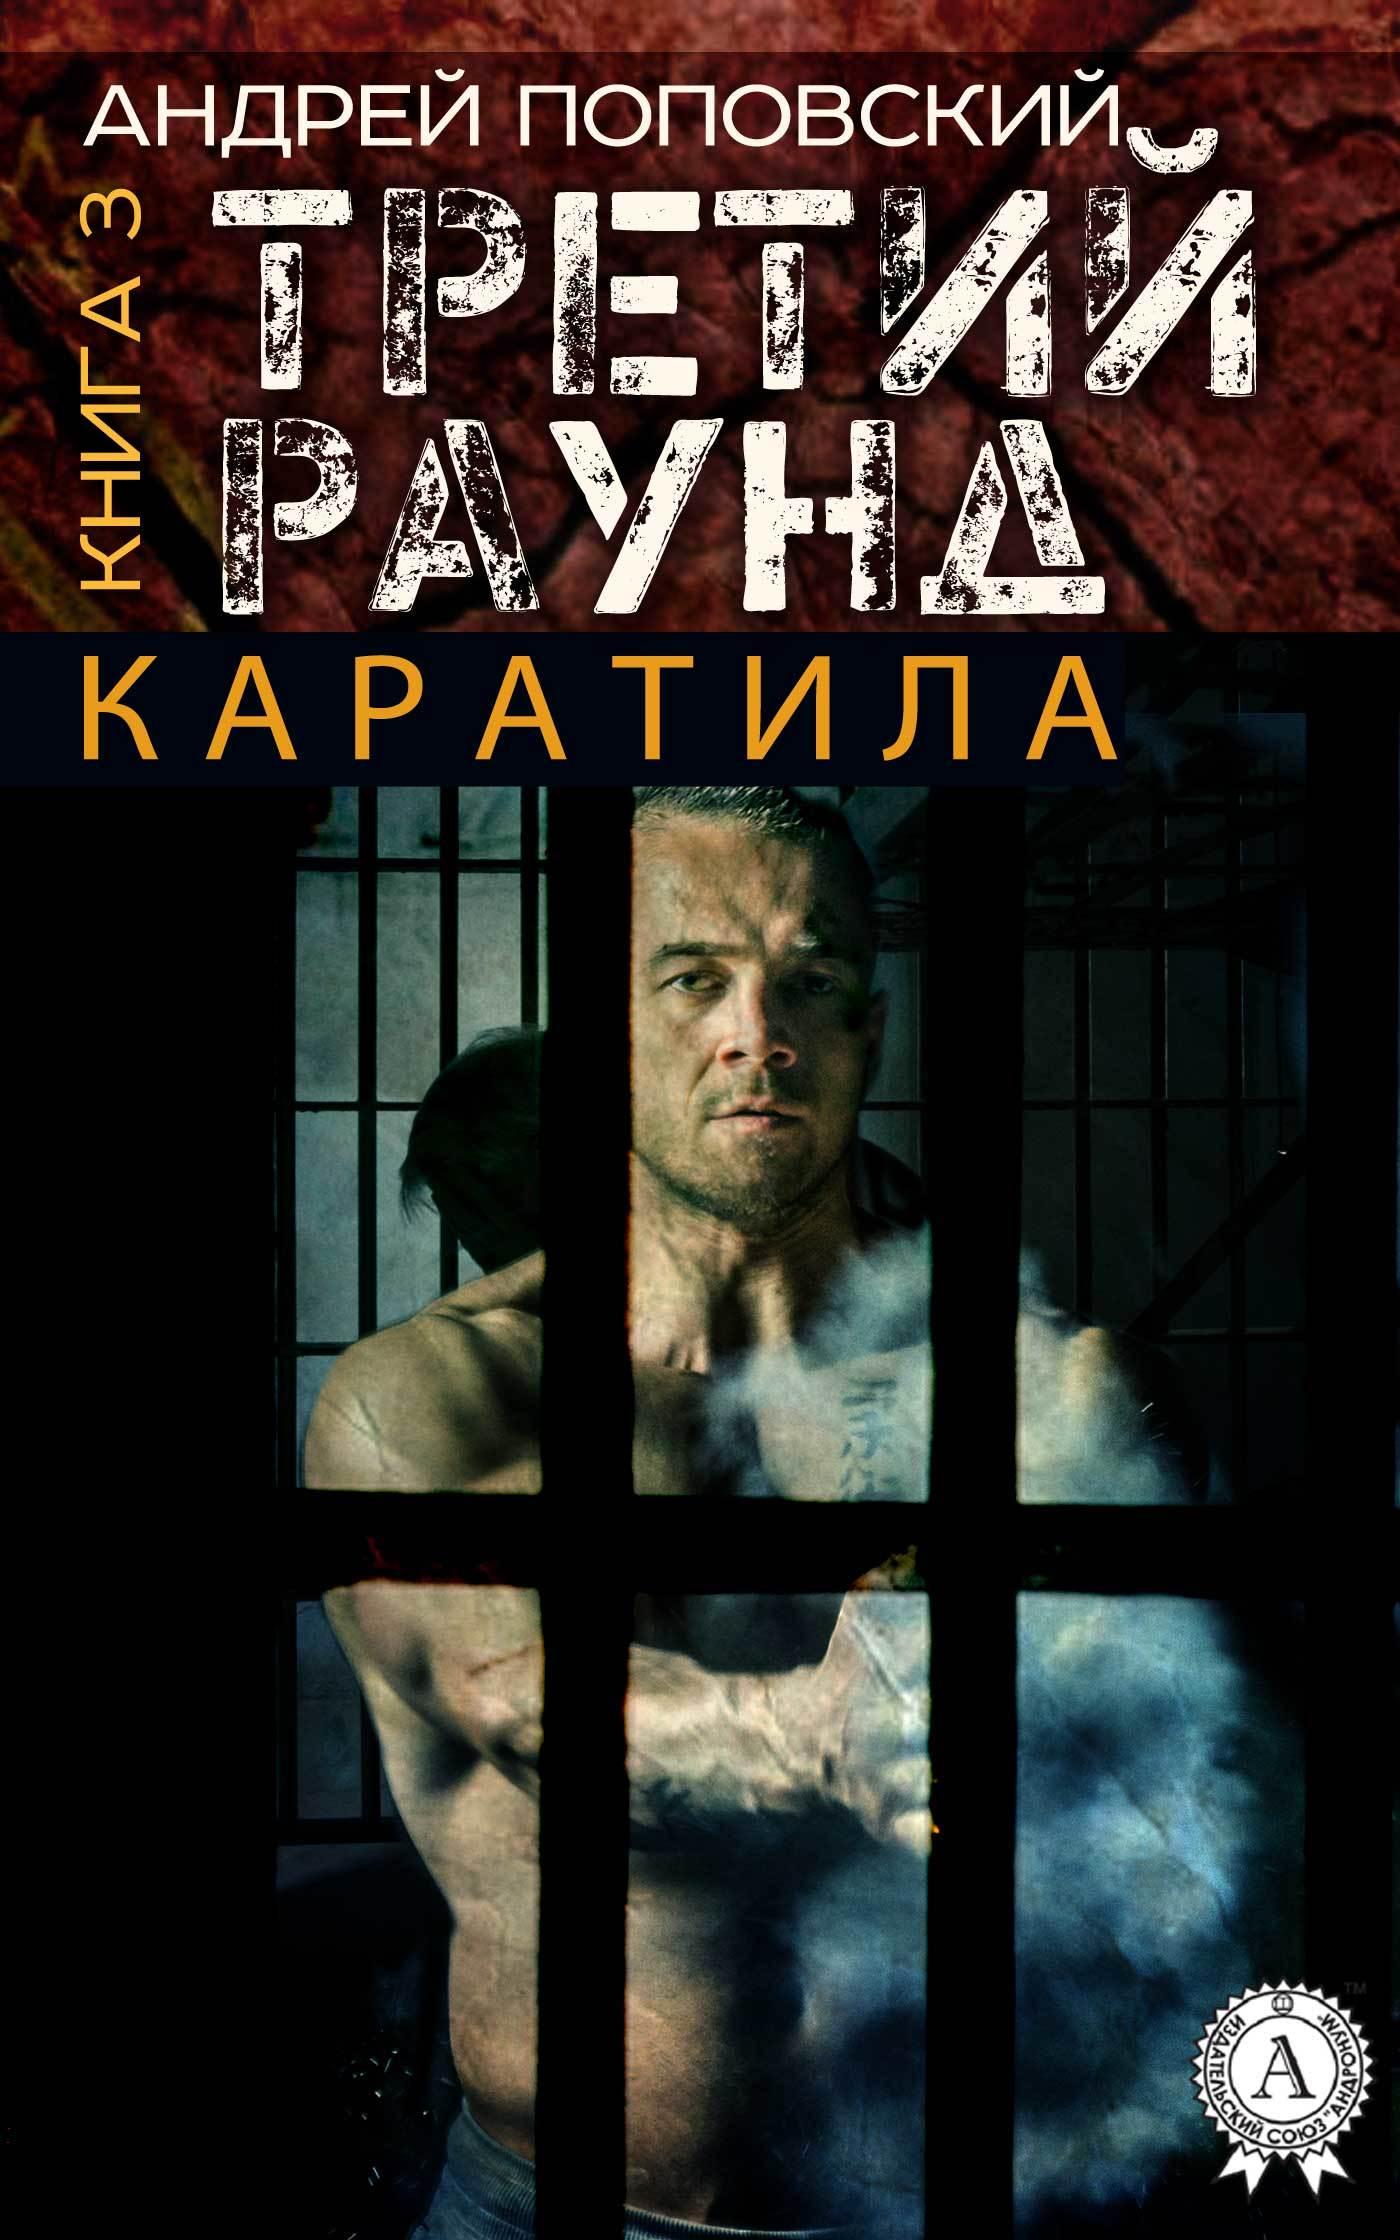 Андрей Поповский Каратила. Книга 3. Третий раунд